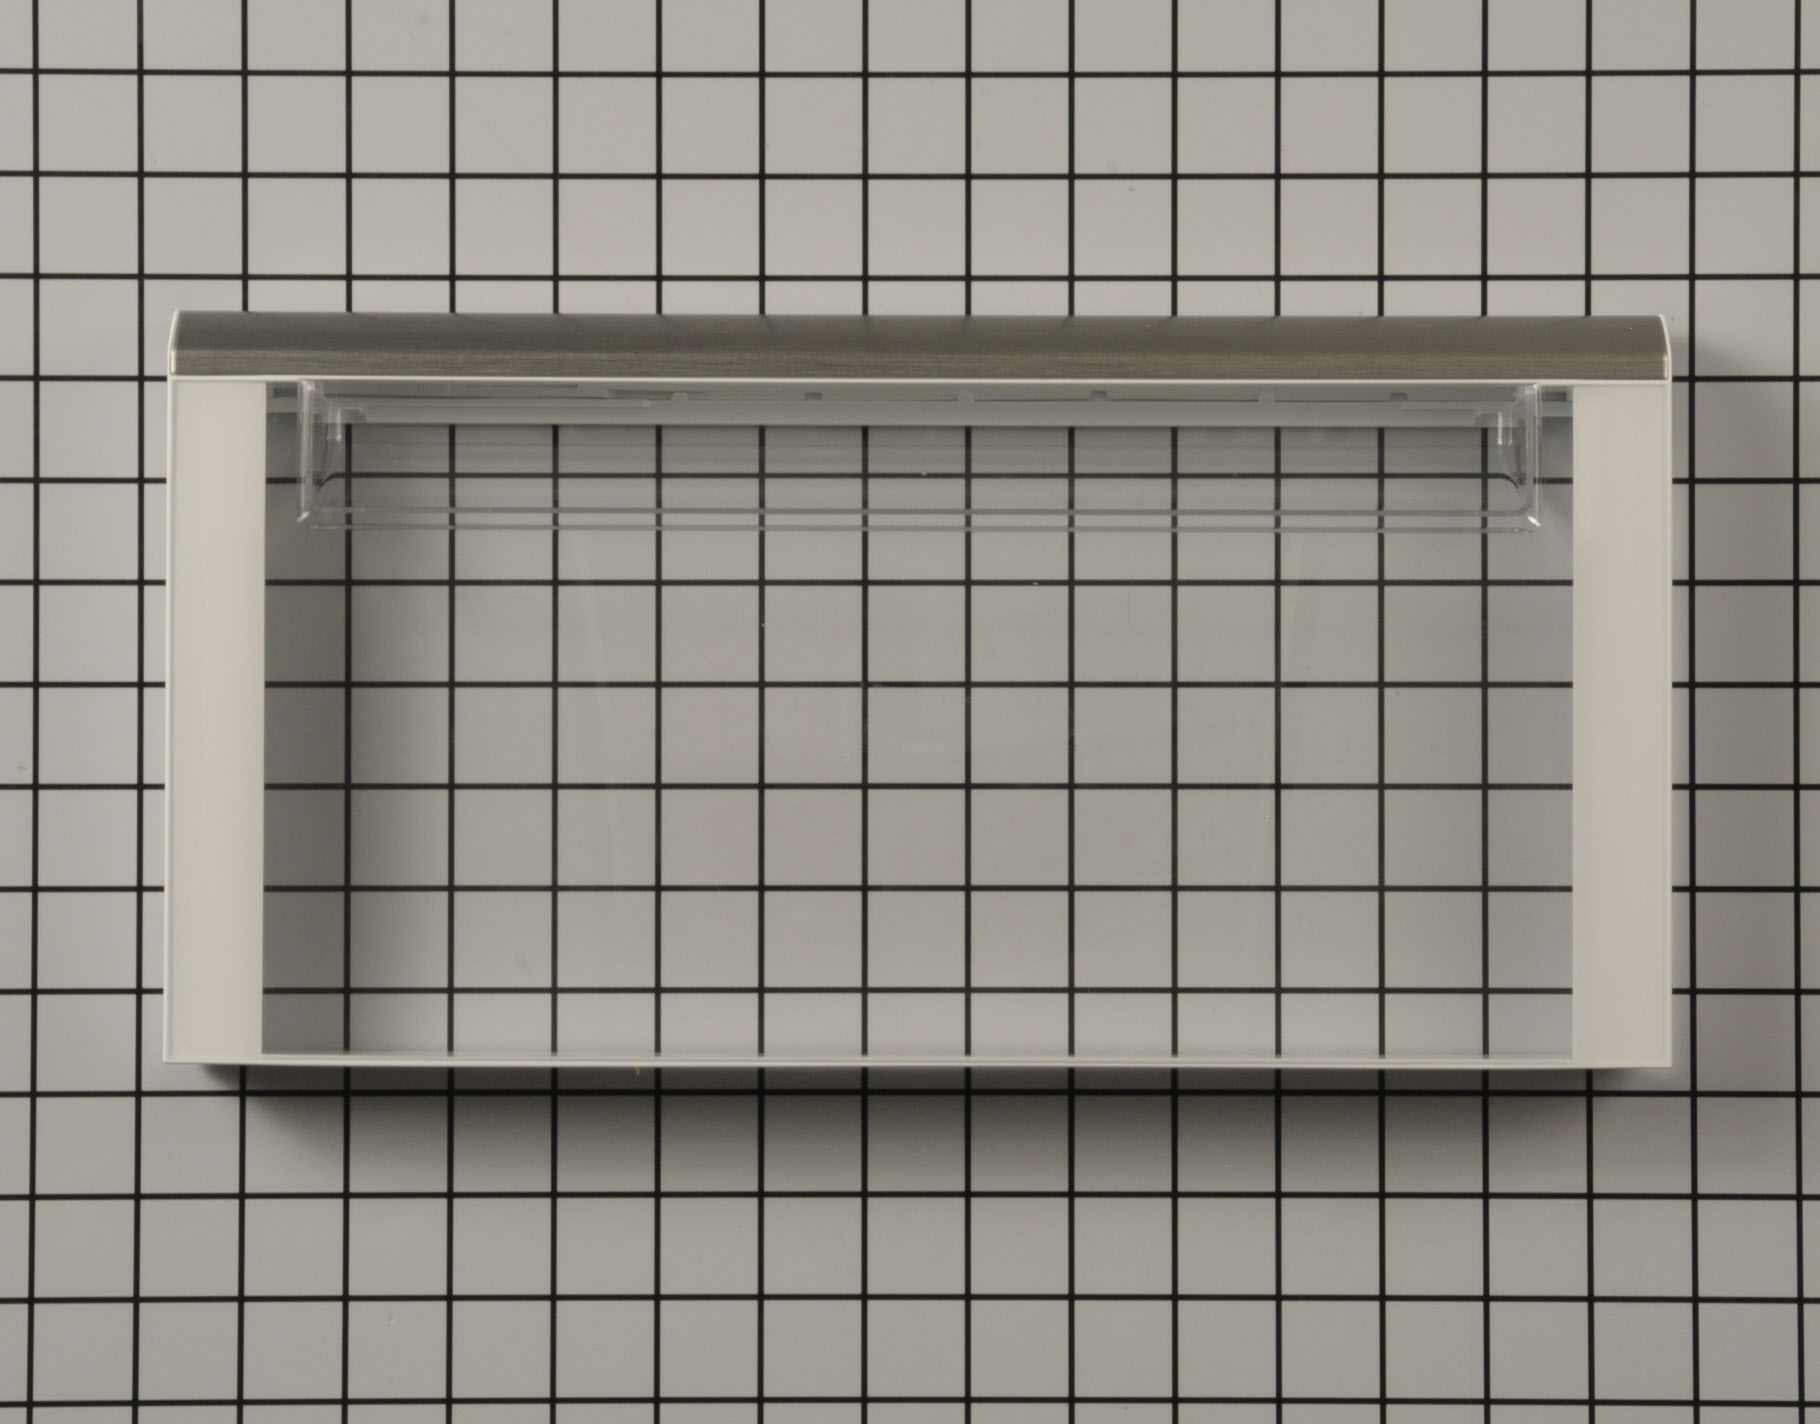 Maytag Refrigerator Part # W10524914 - Drawer Front